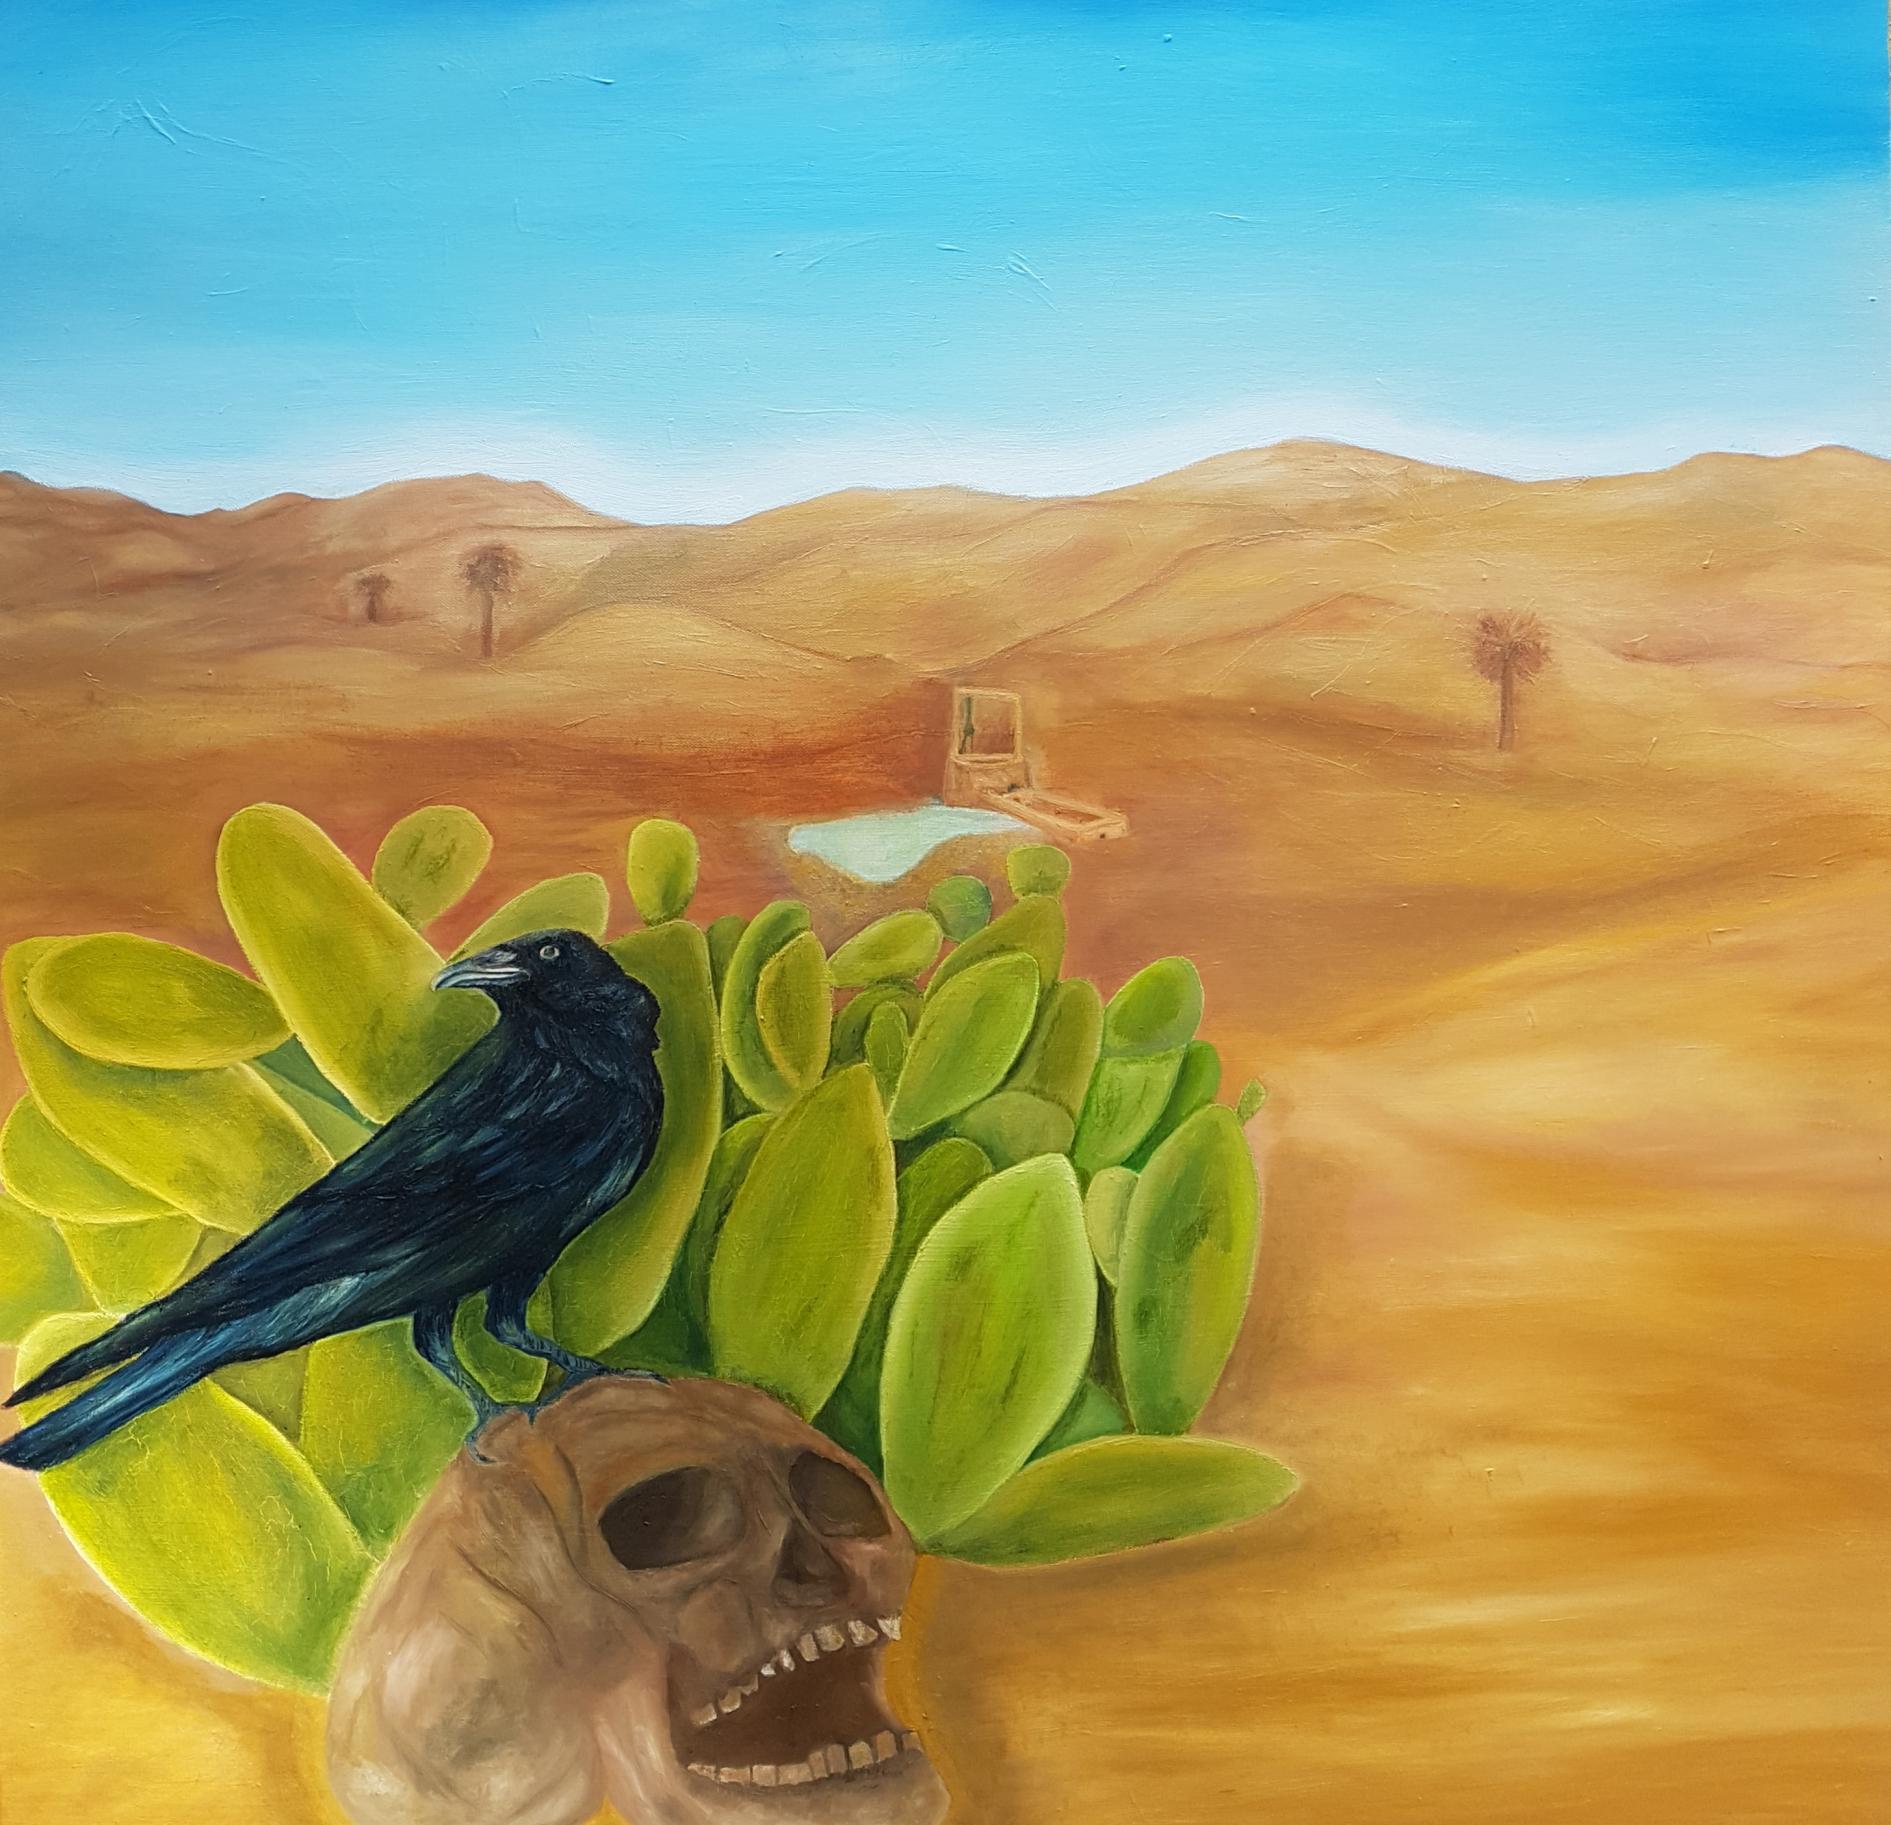 Klimawandel (2018) - Pompeyo Curbelo Martín